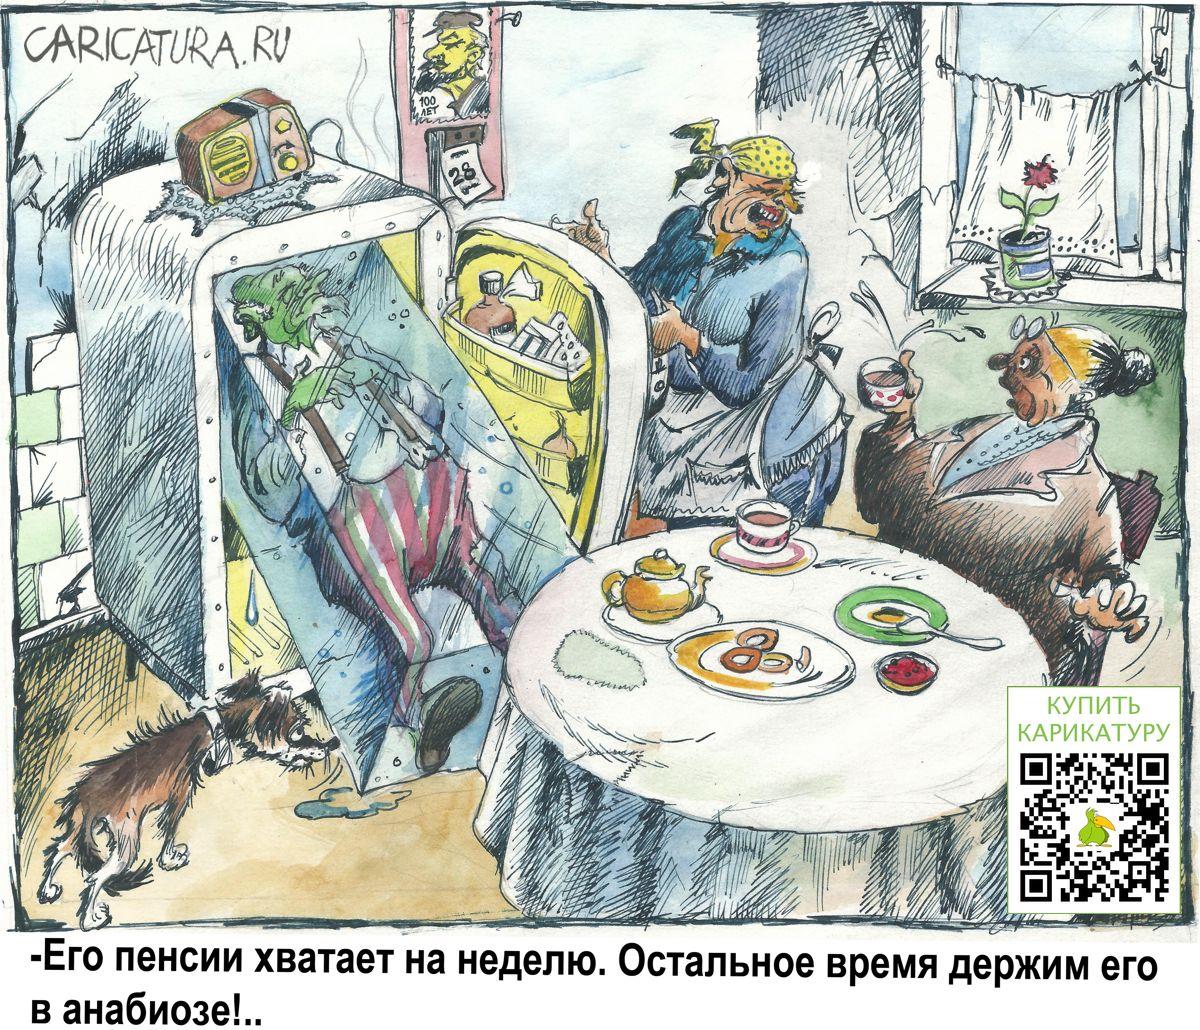 Анабиоз, Александр Шульпинов